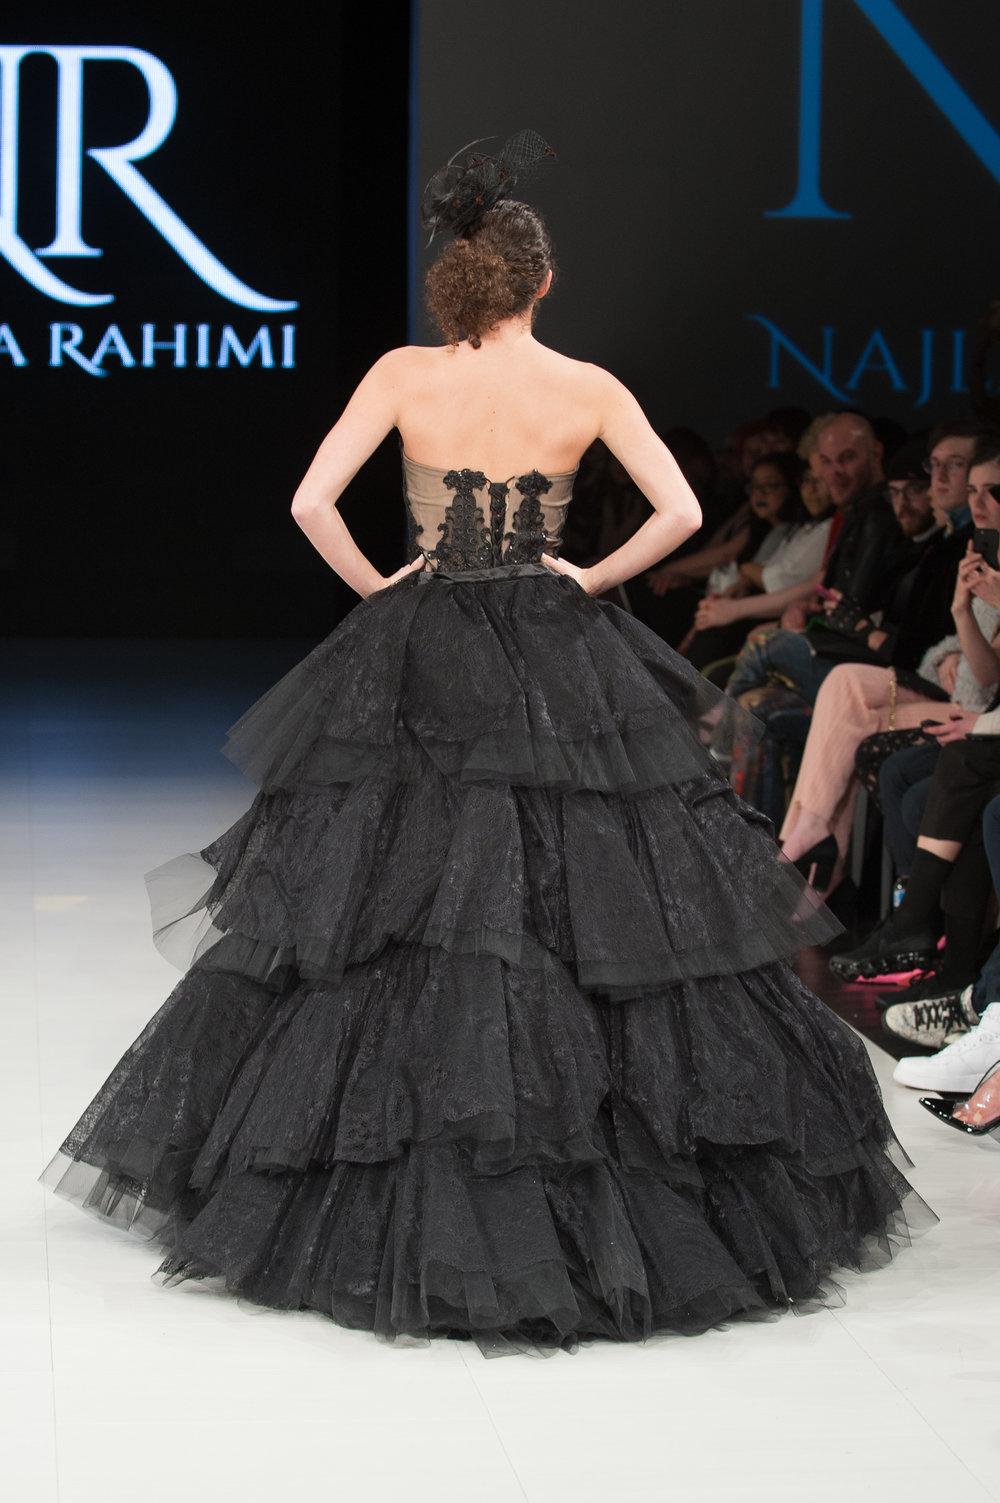 FAT2018-Day1-April17-Najla_Rahimi-Runway-Che_Rosales-LARAWAN-5767.jpg